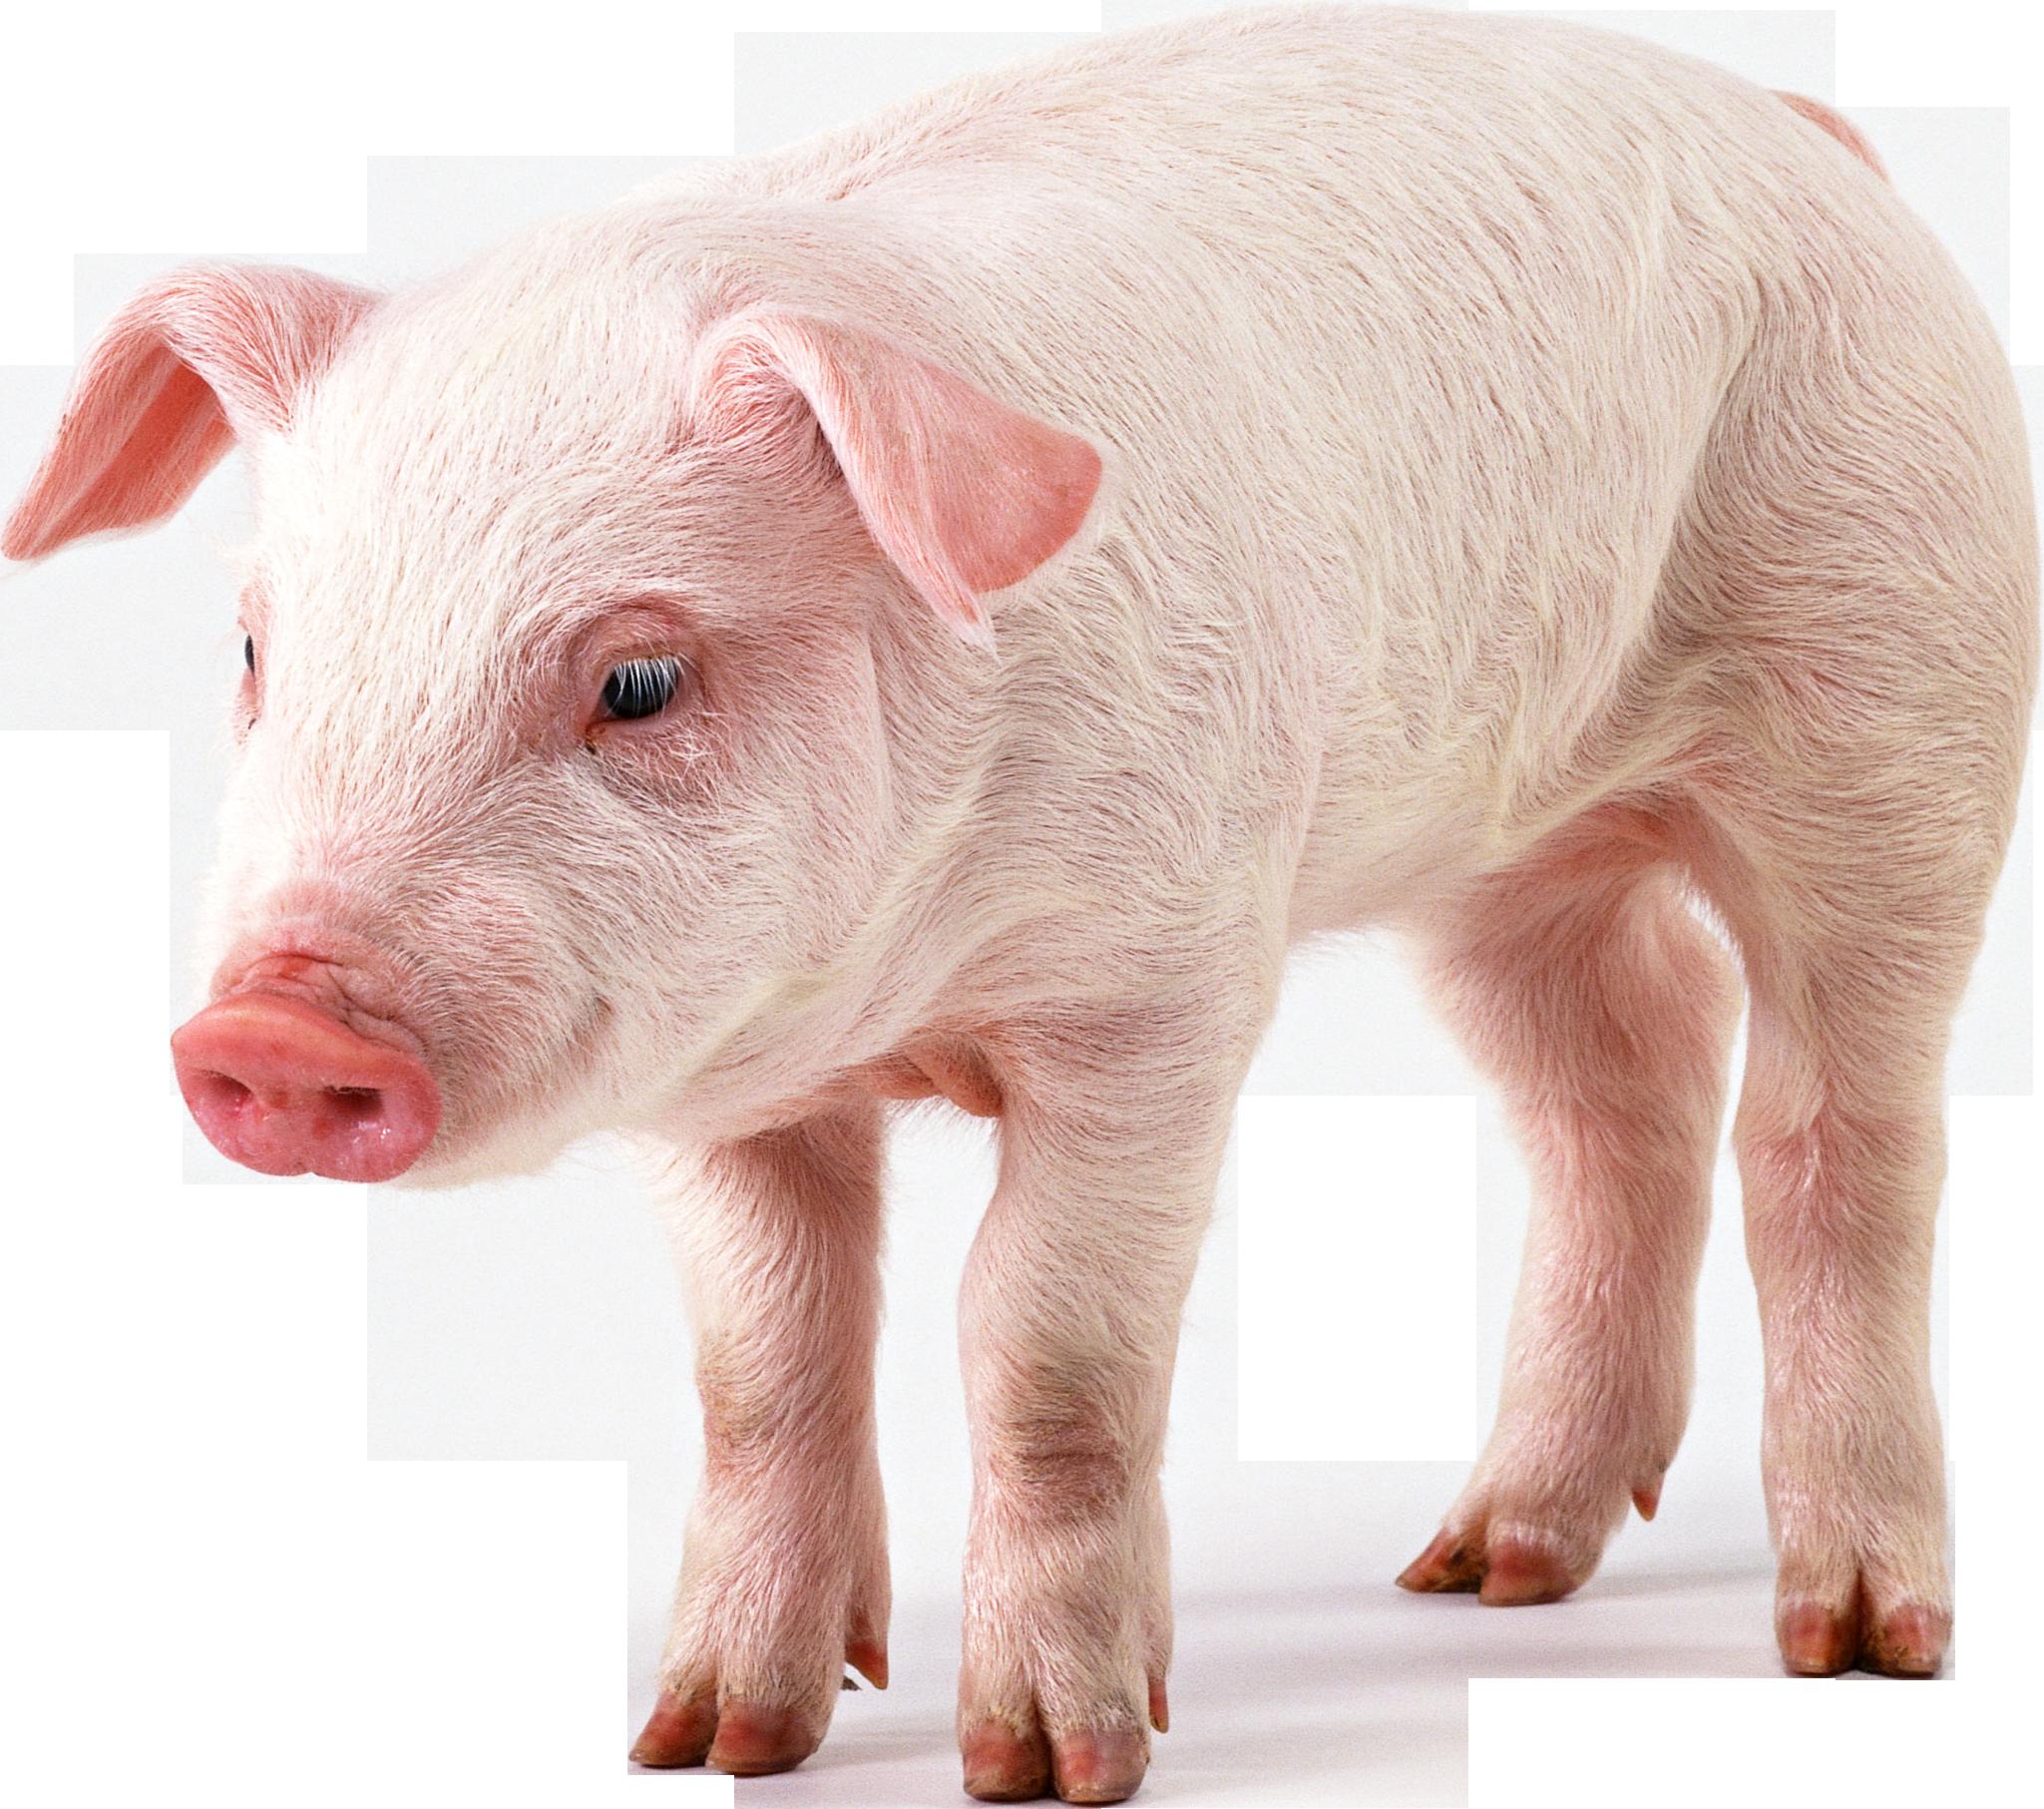 Pig Png Pig Pictures Pig Png Pig Wallpaper